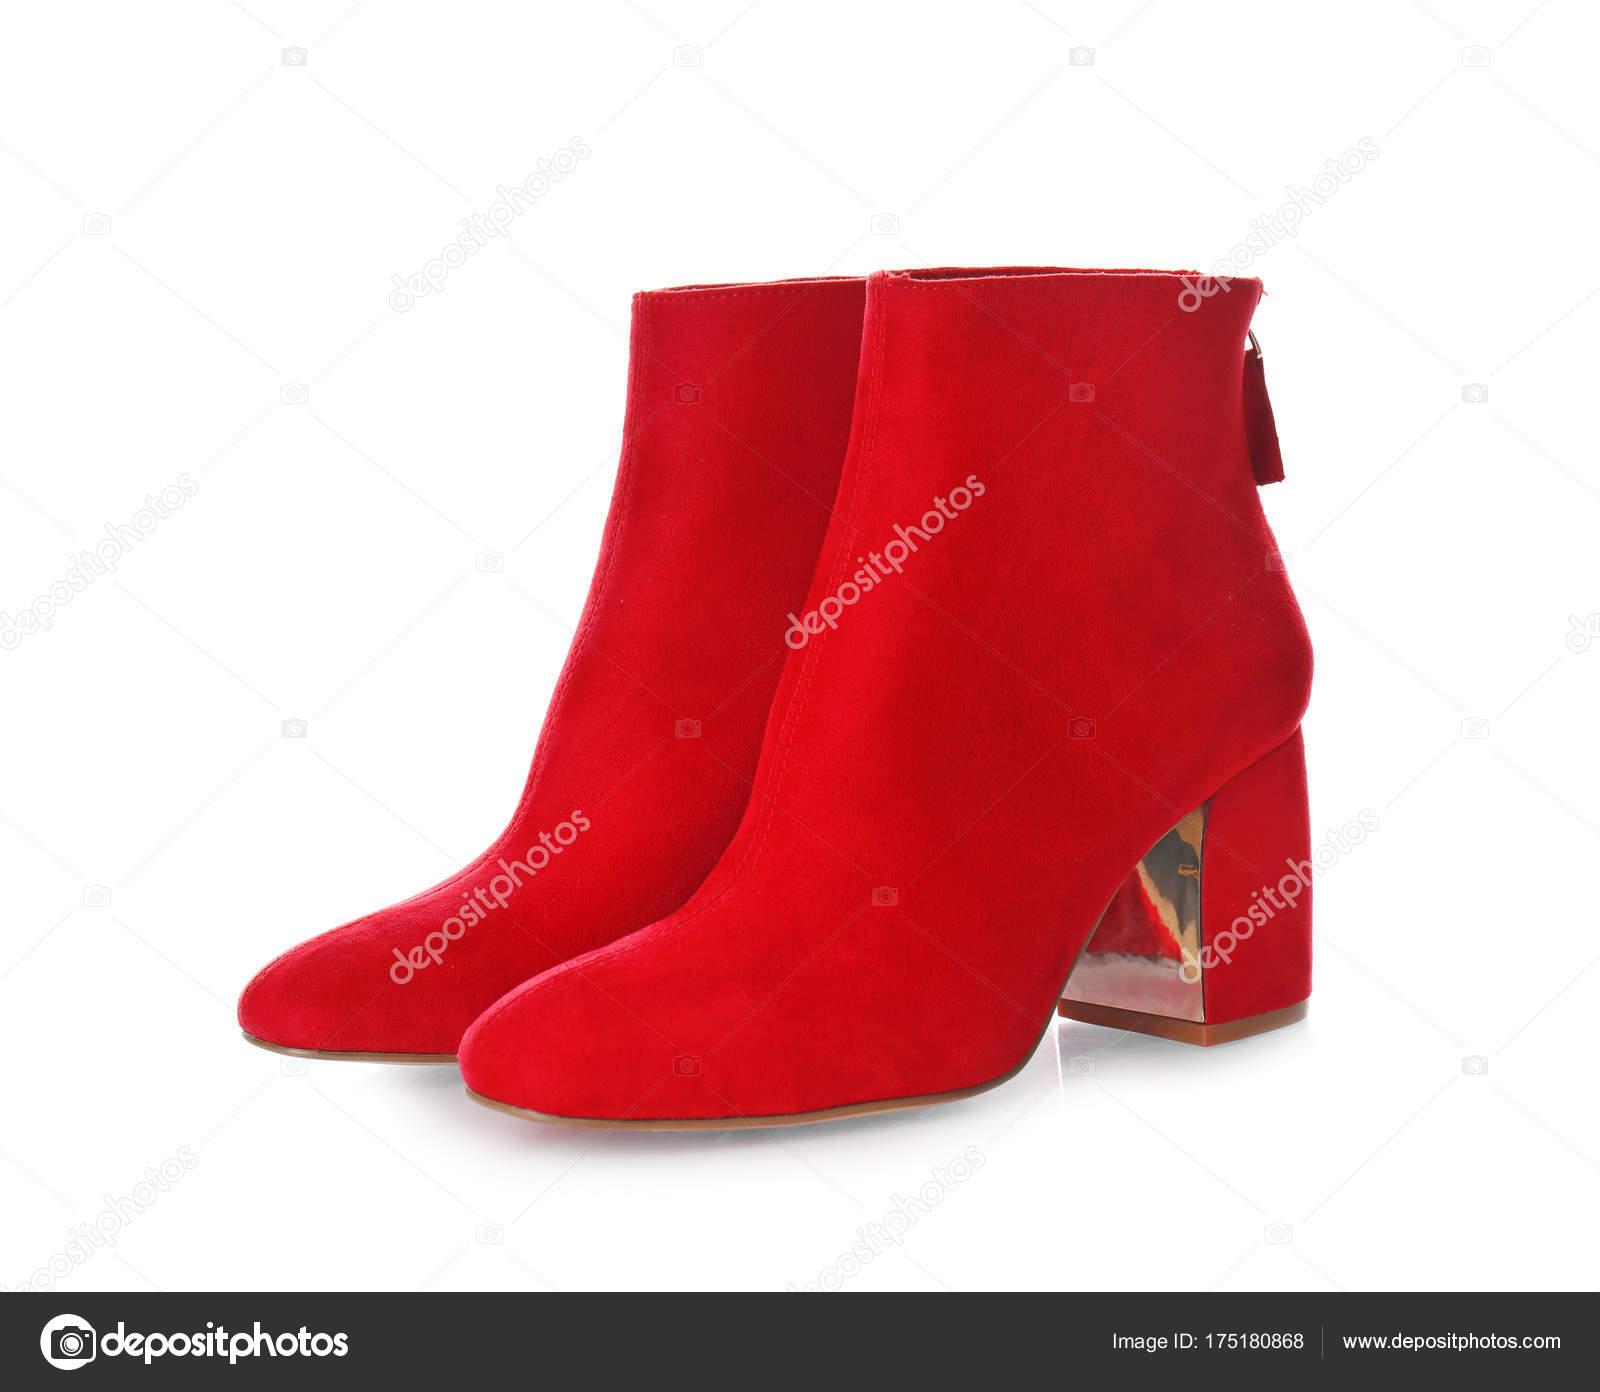 Femme Rouge Femme Femme De Bottes Bottes Bottes Rouge Paire Rouge Paire De De Paire 7YxApqn